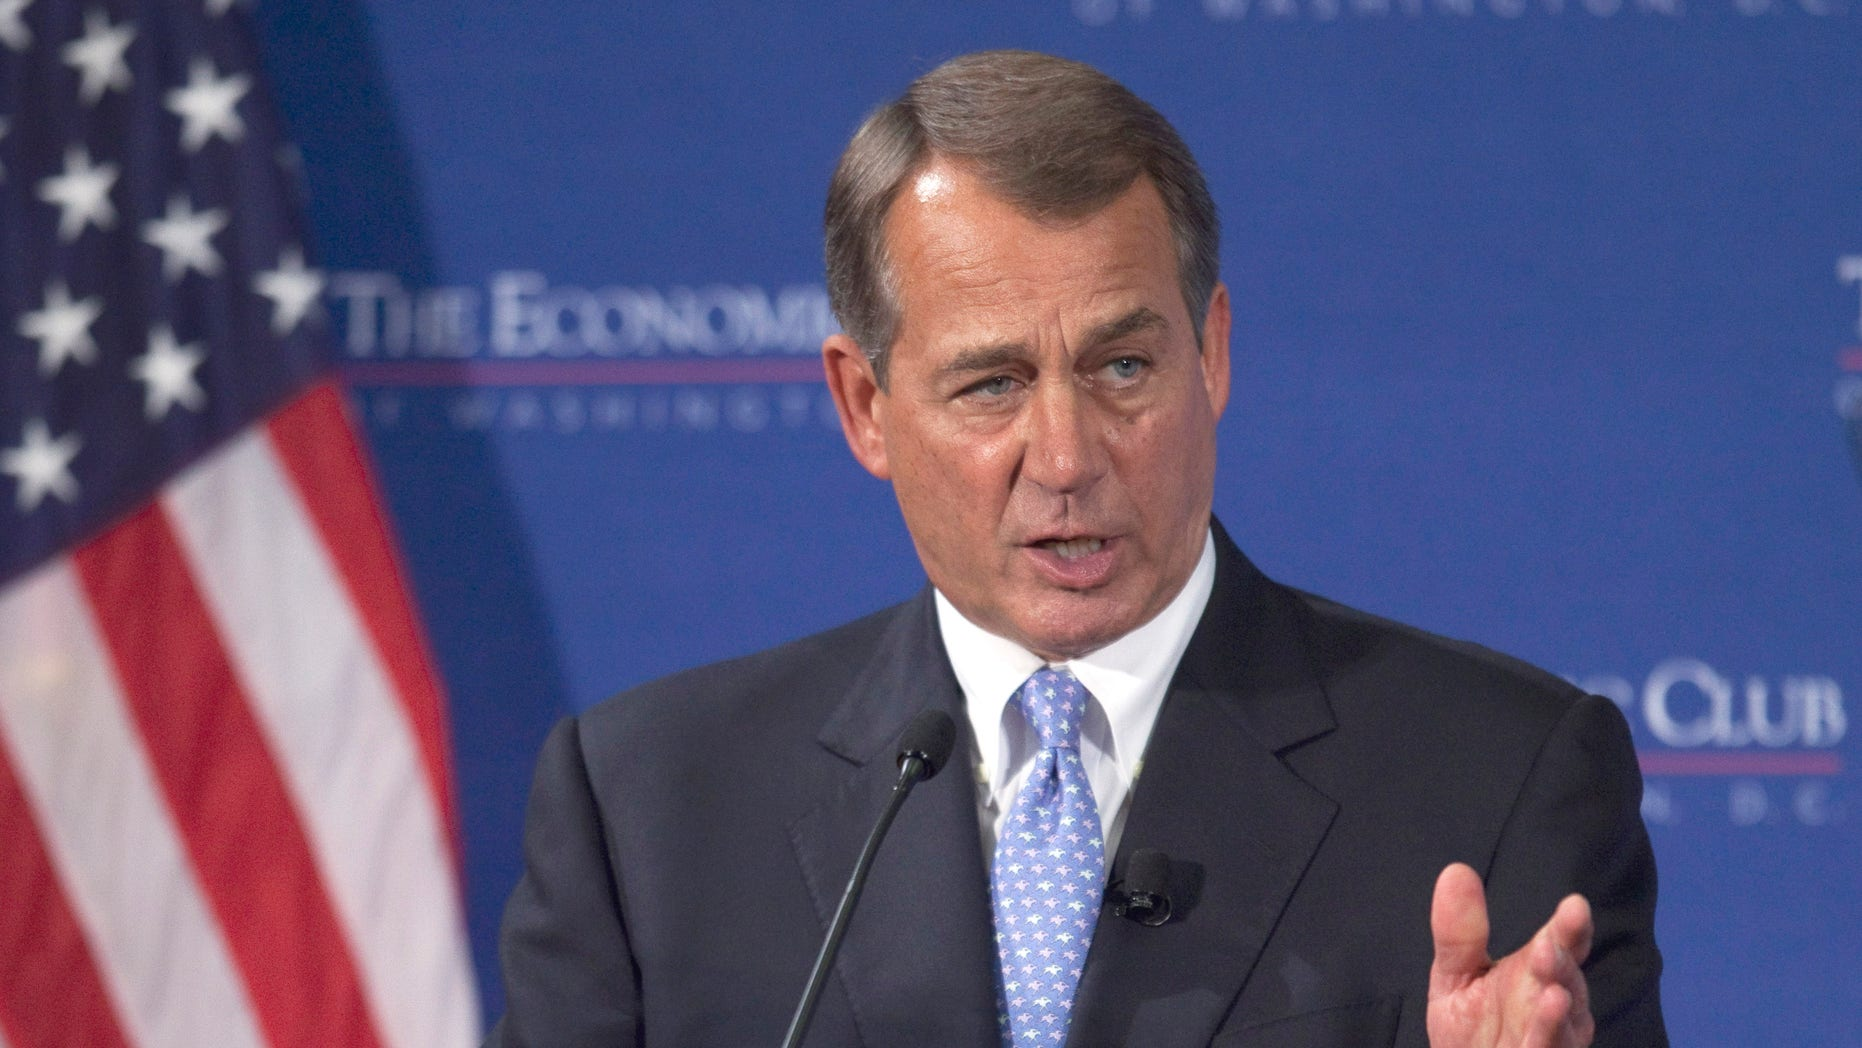 House Speaker John Boehner of Ohio talks about the economy during an address at the Economic Club of Washington, in Washington, Thursday, Sept. 15, 2011.